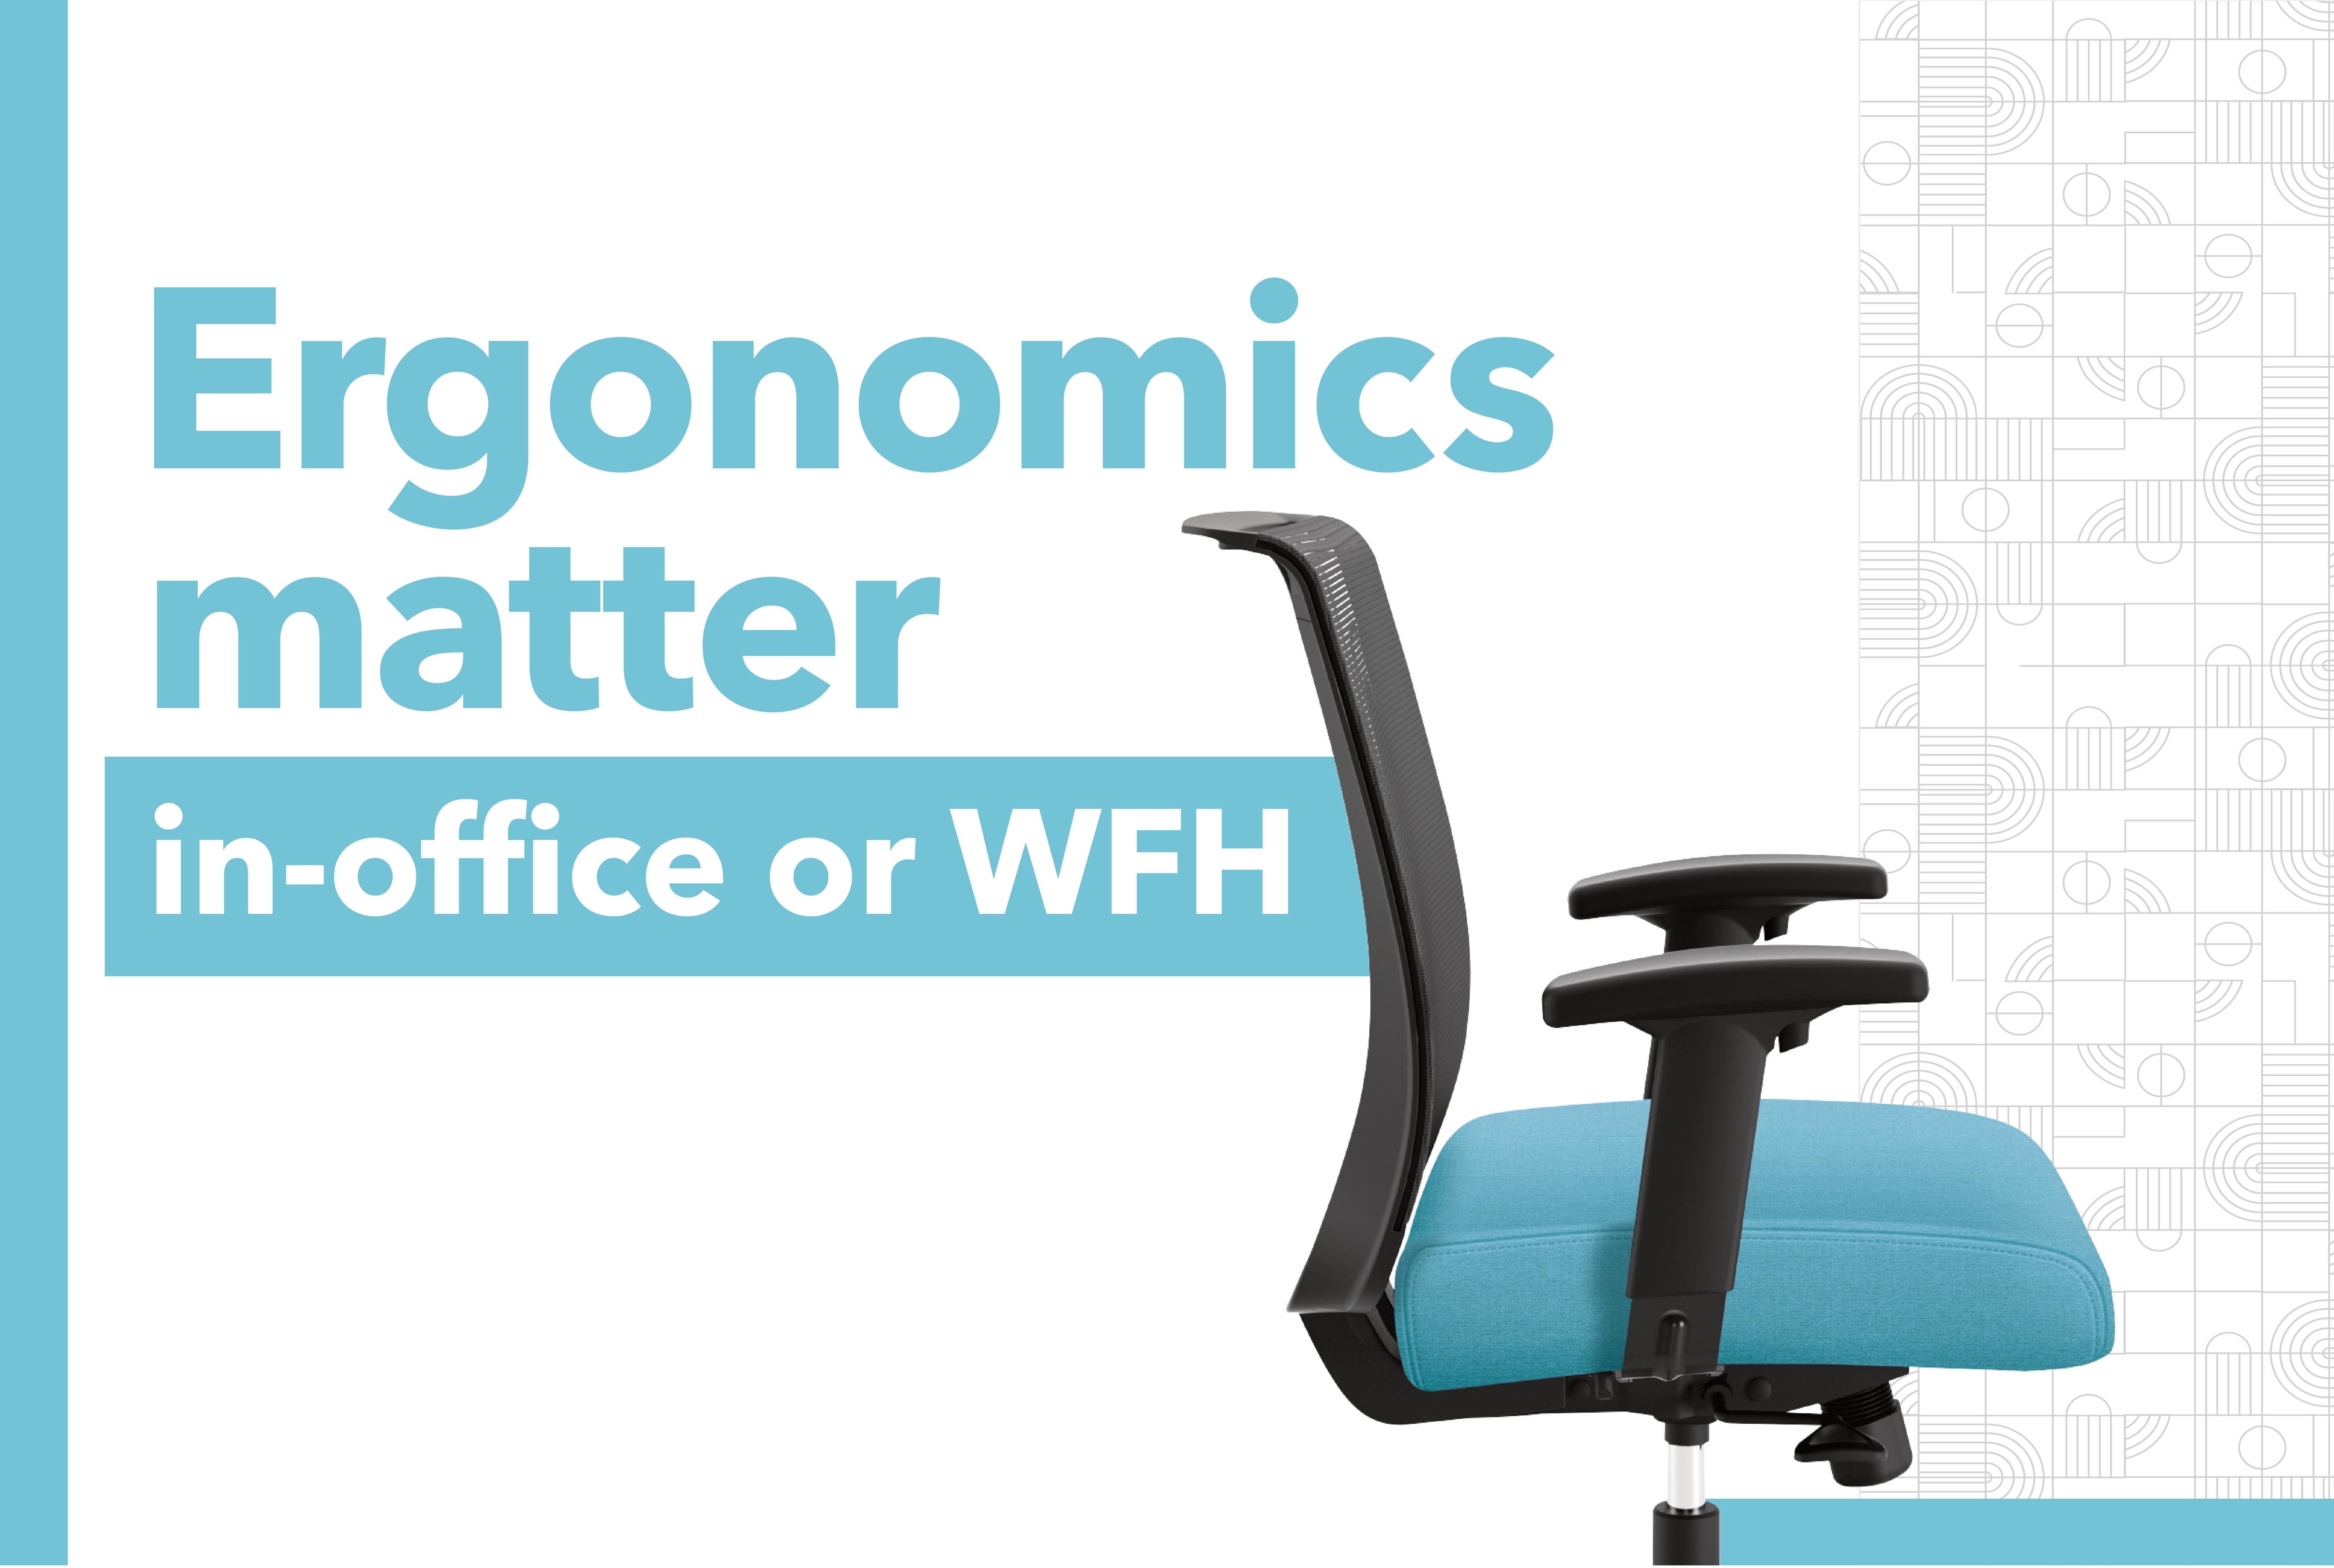 Ergonomics matter in-office or WFH